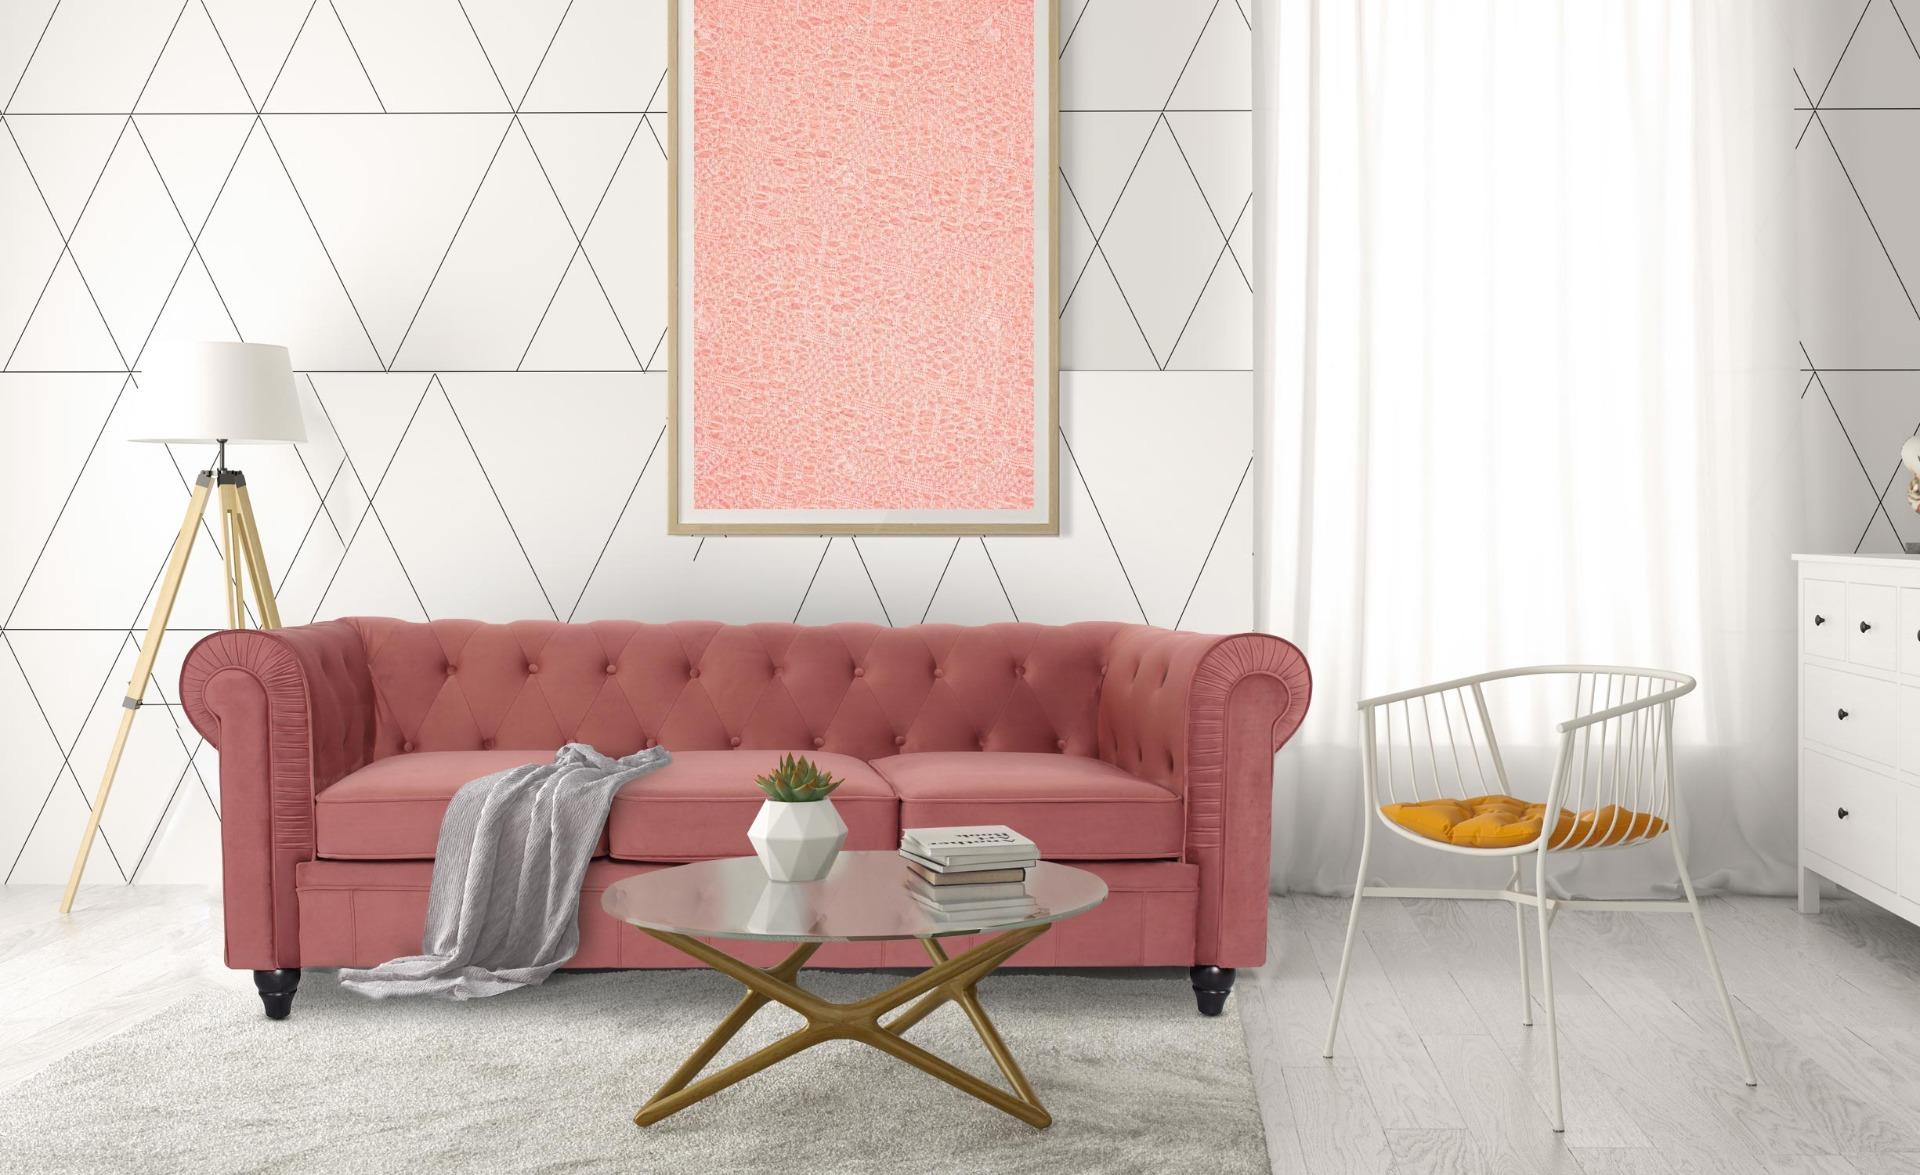 Grand Canapé Chesterfield 3-Sitzer Sofa mit Samtbezug Rosa